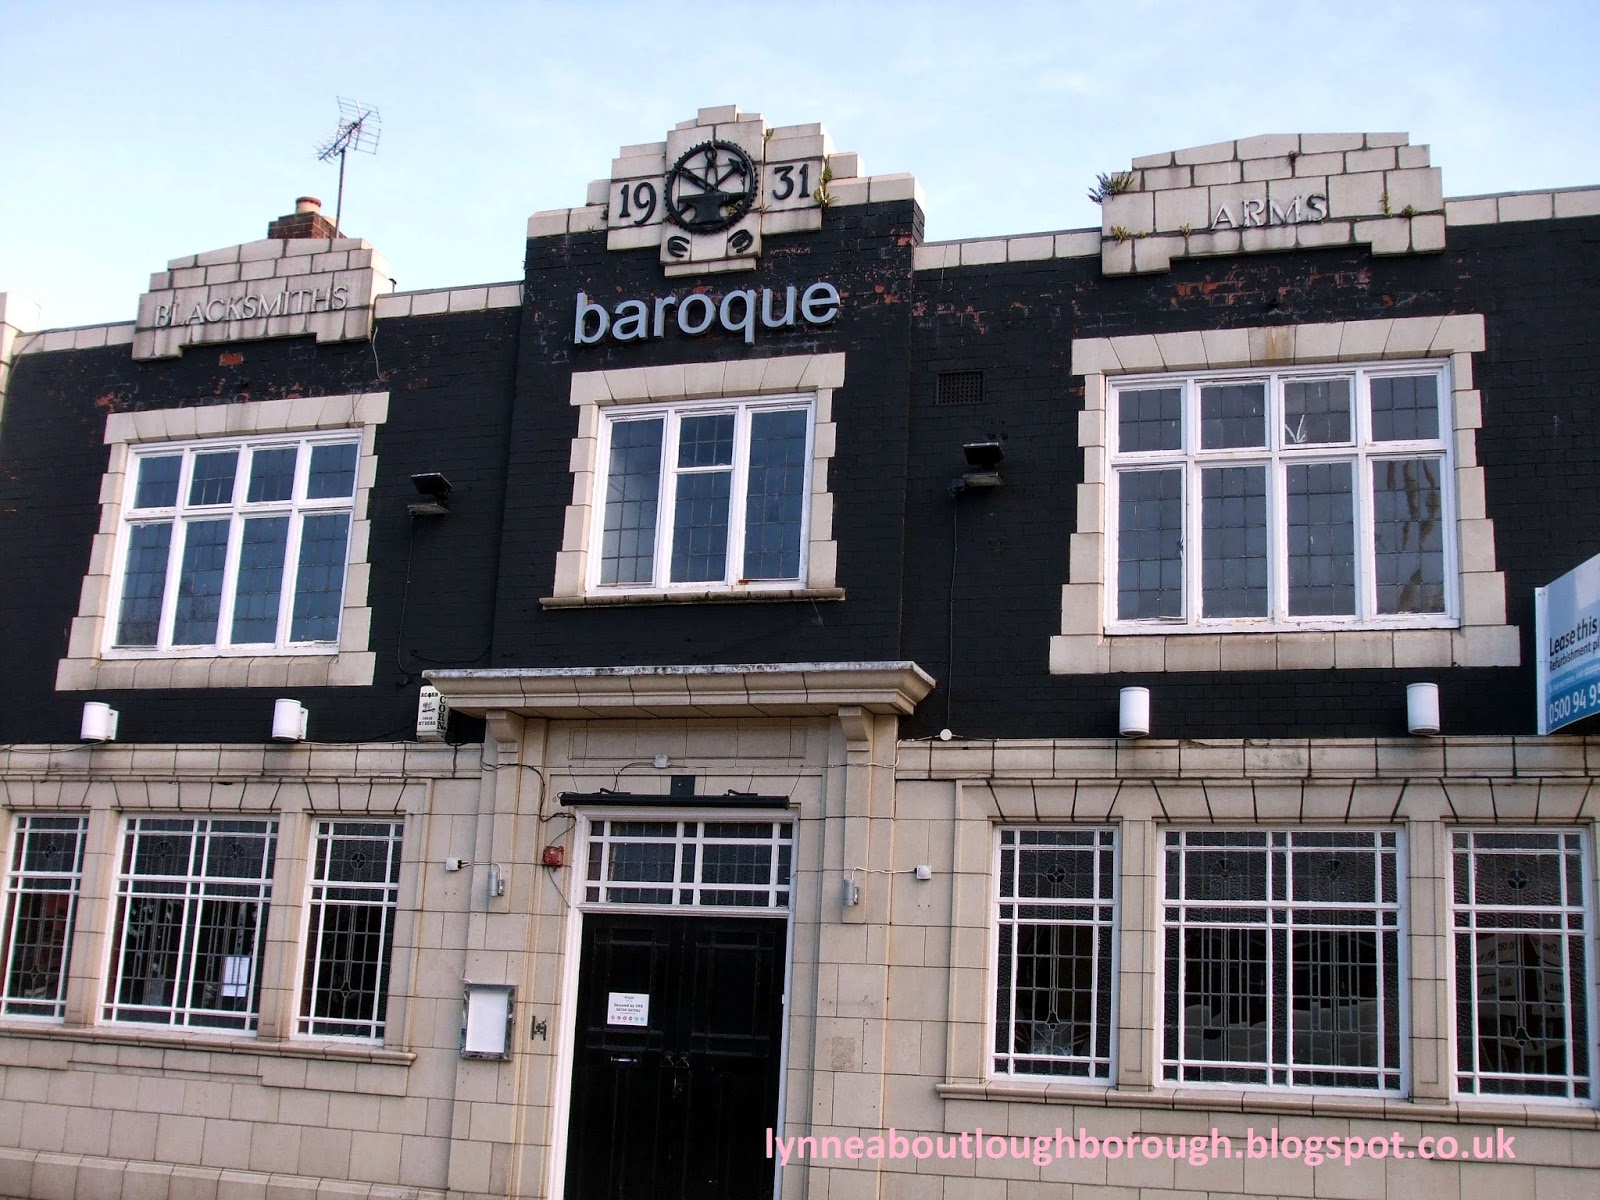 http://lynneaboutloughborough.blogspot.co.uk/2015/02/pub-quiz.html